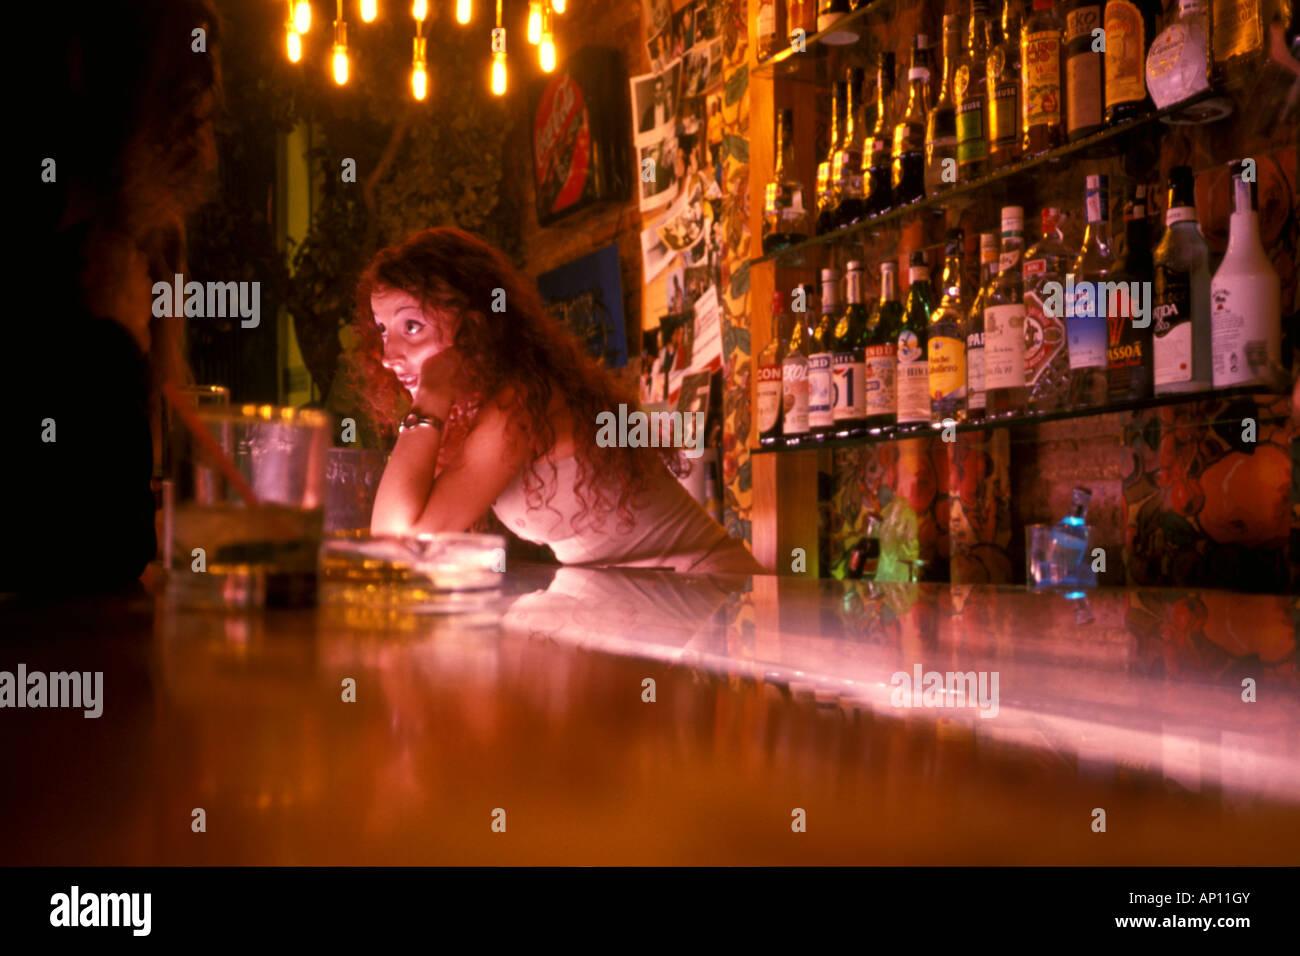 Night club raval barcelona spain stock photo royalty for Night club barcelona